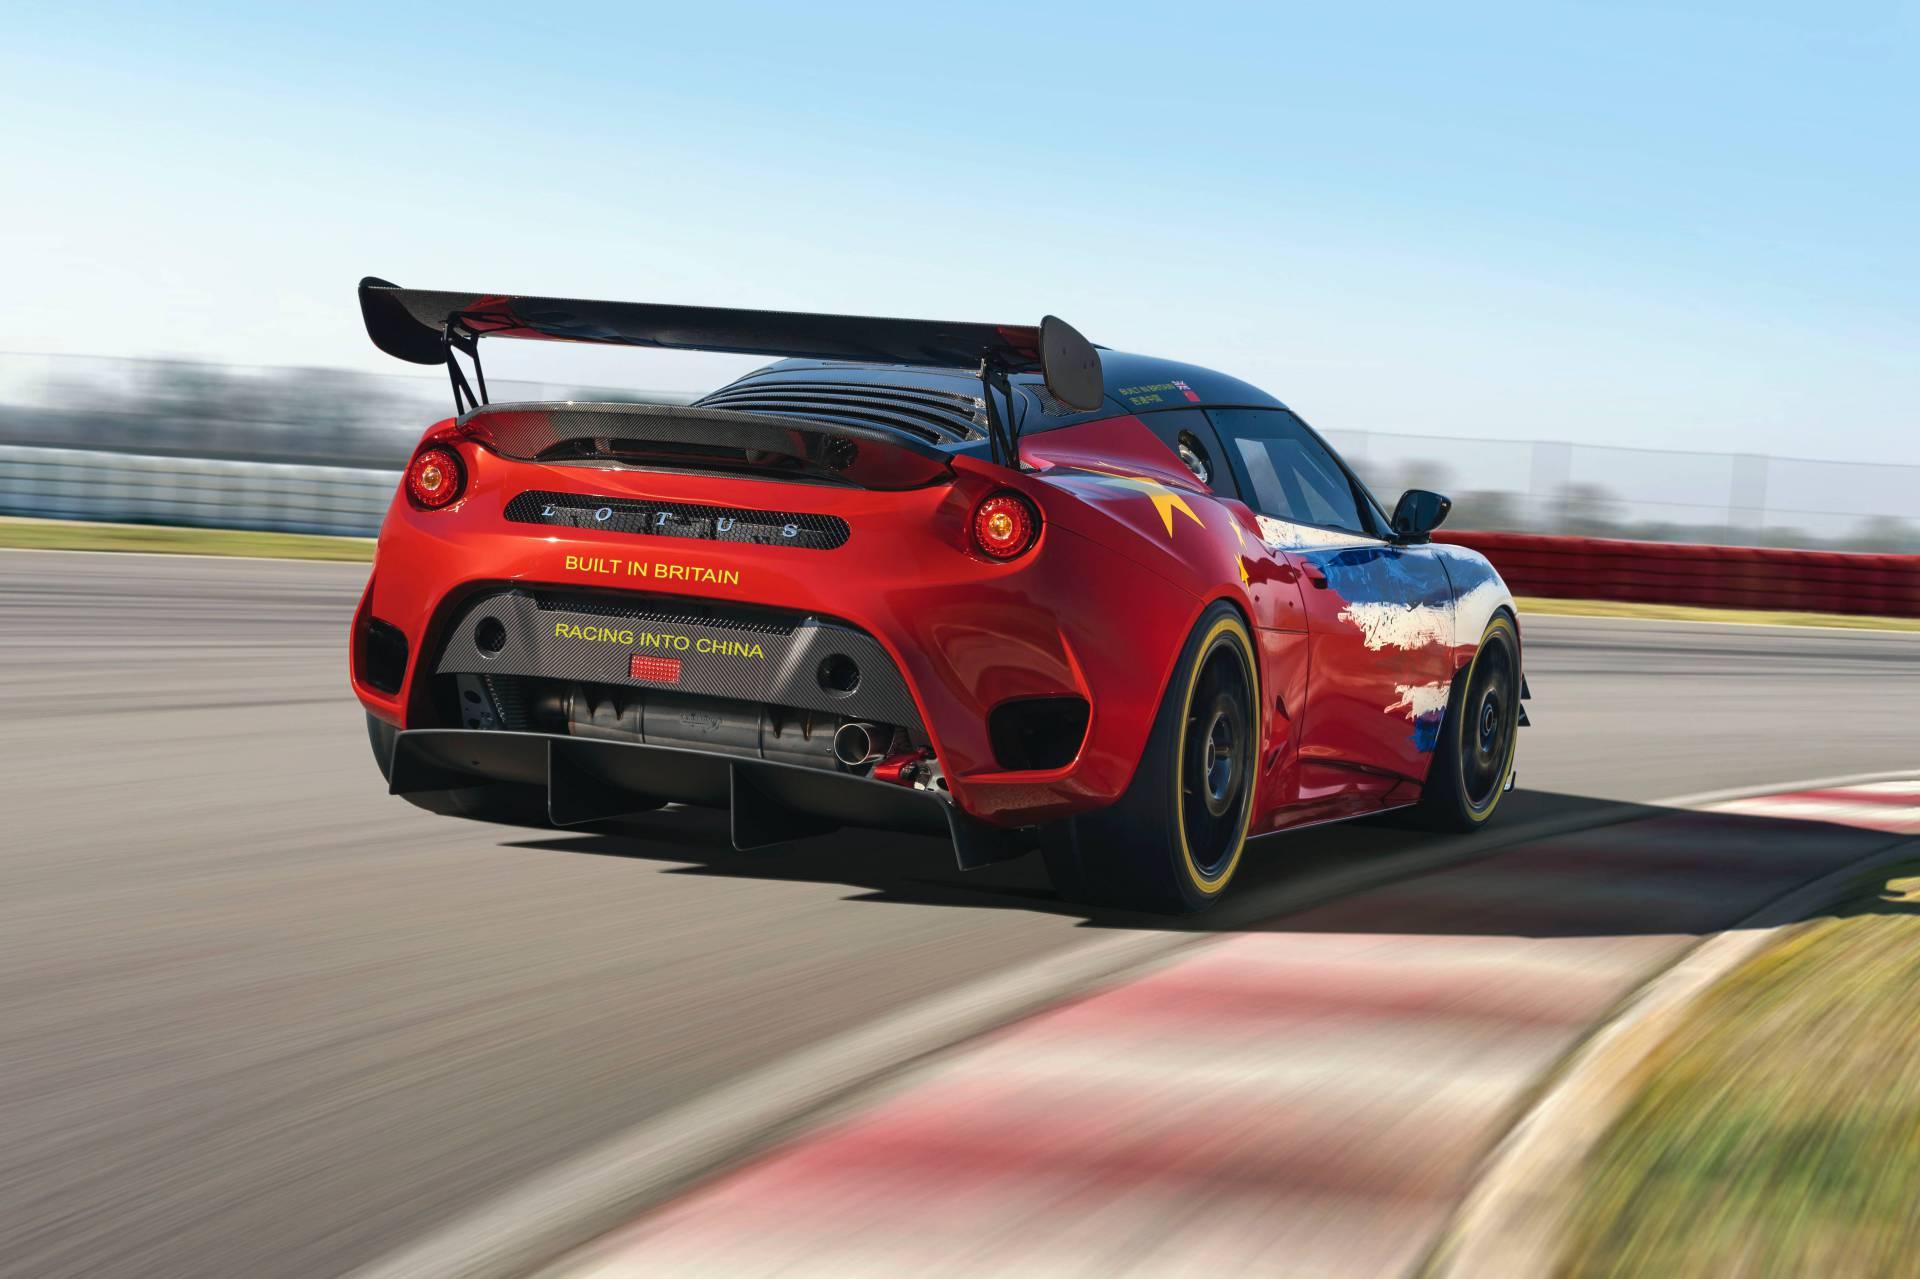 Lotus-Evora-GT4-Concept-7